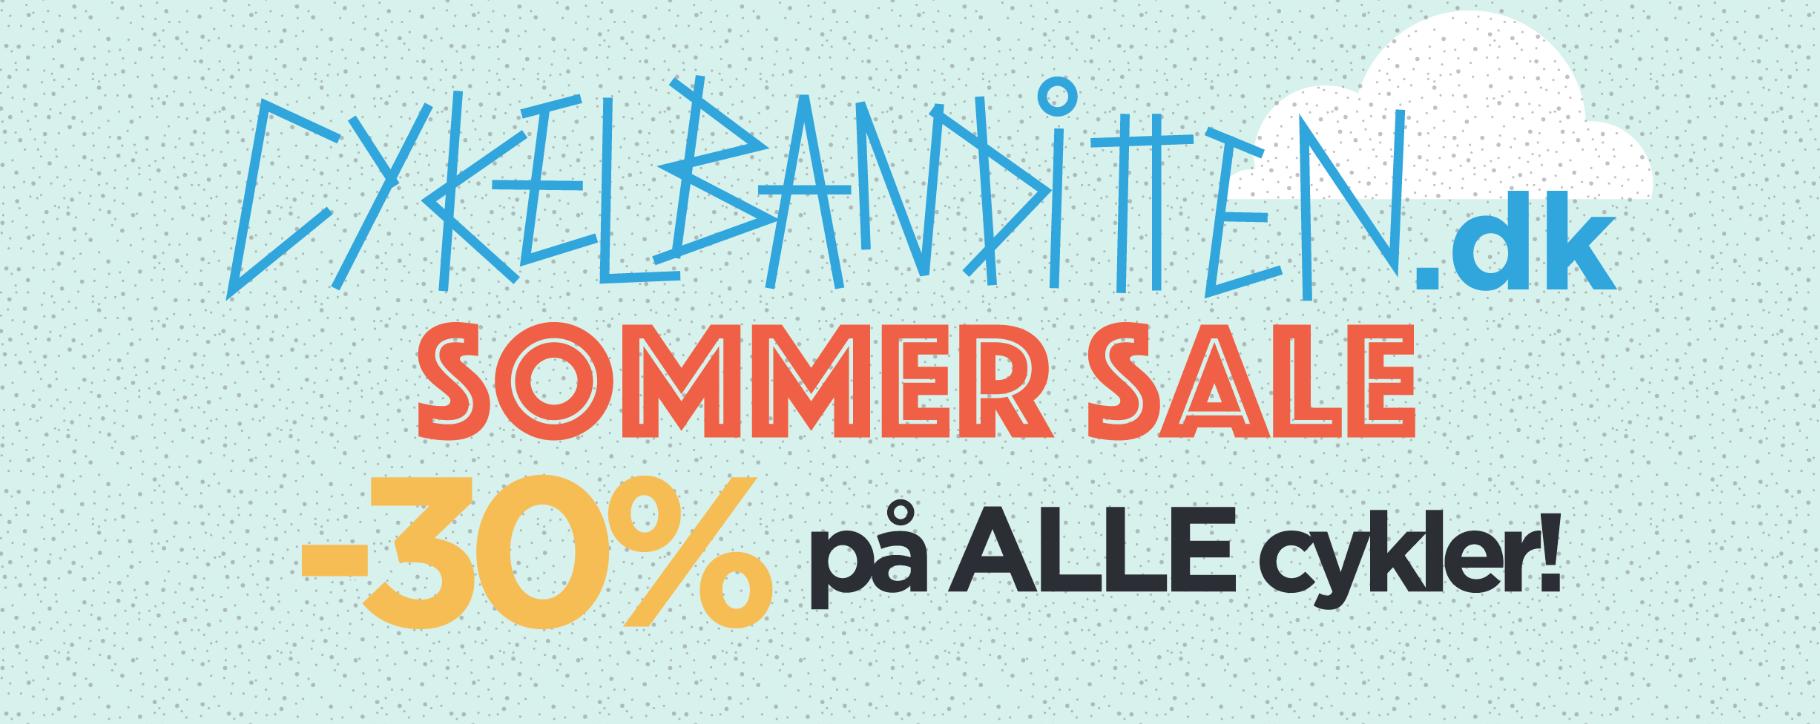 Cykelbanditten.dk - Sommer Sale 30% rabat på alle cykler